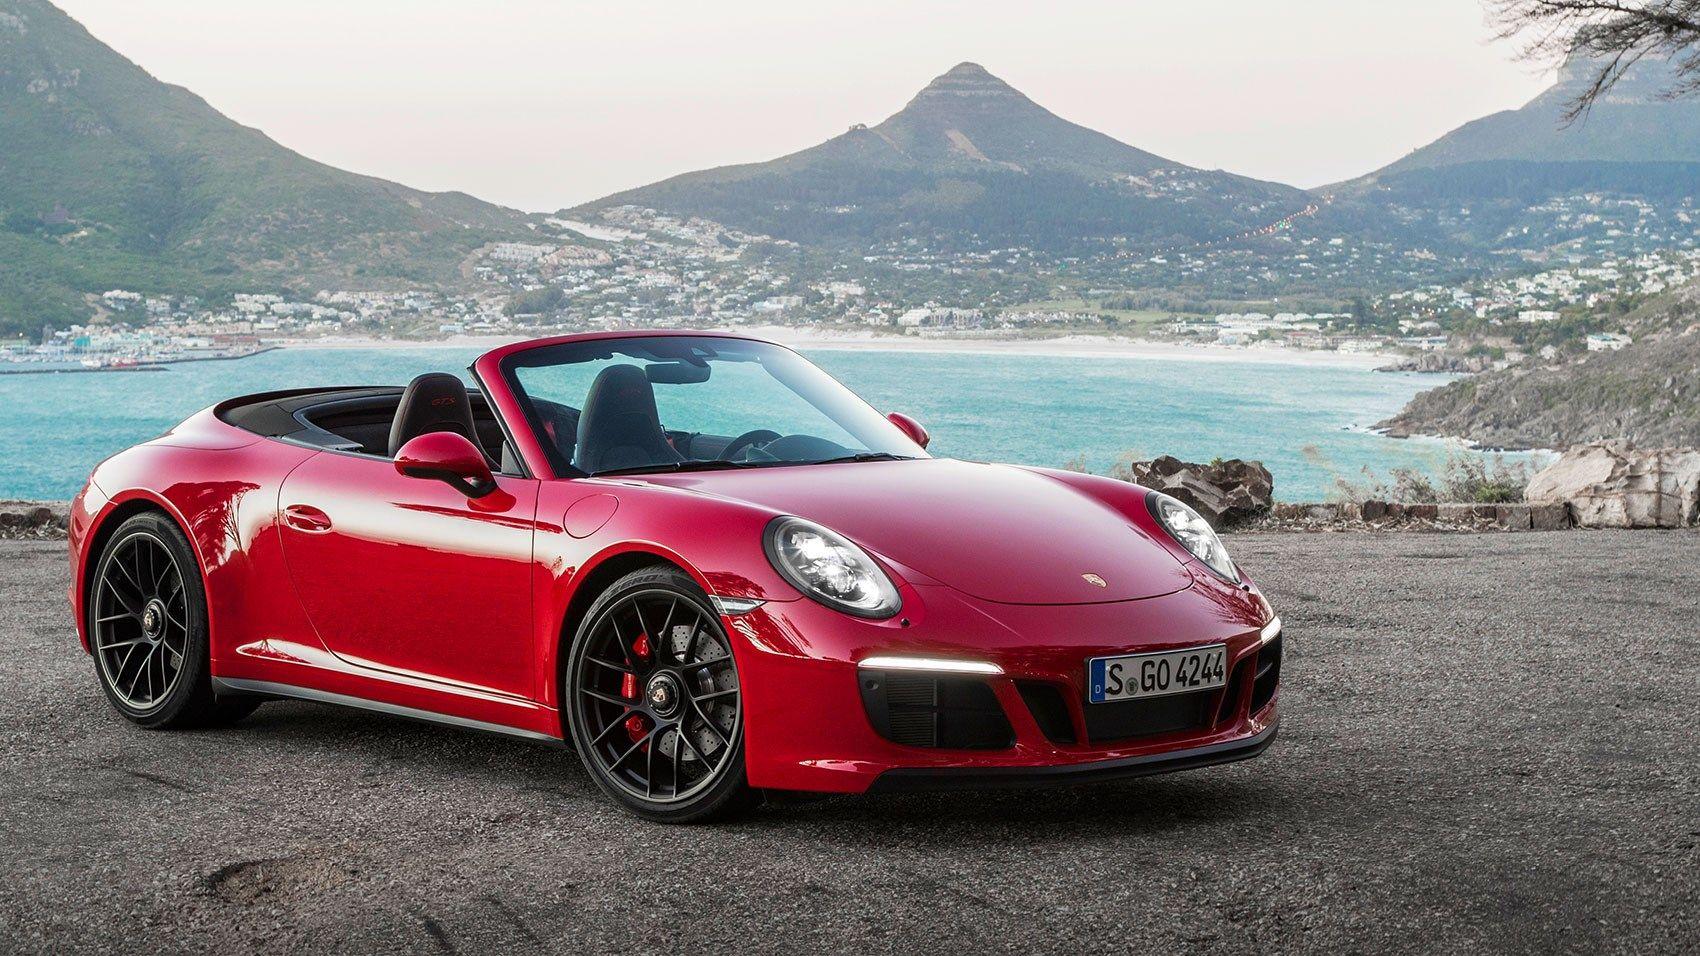 Foto 3 de Compraventa de automóviles en  | Quality Luxe Cars